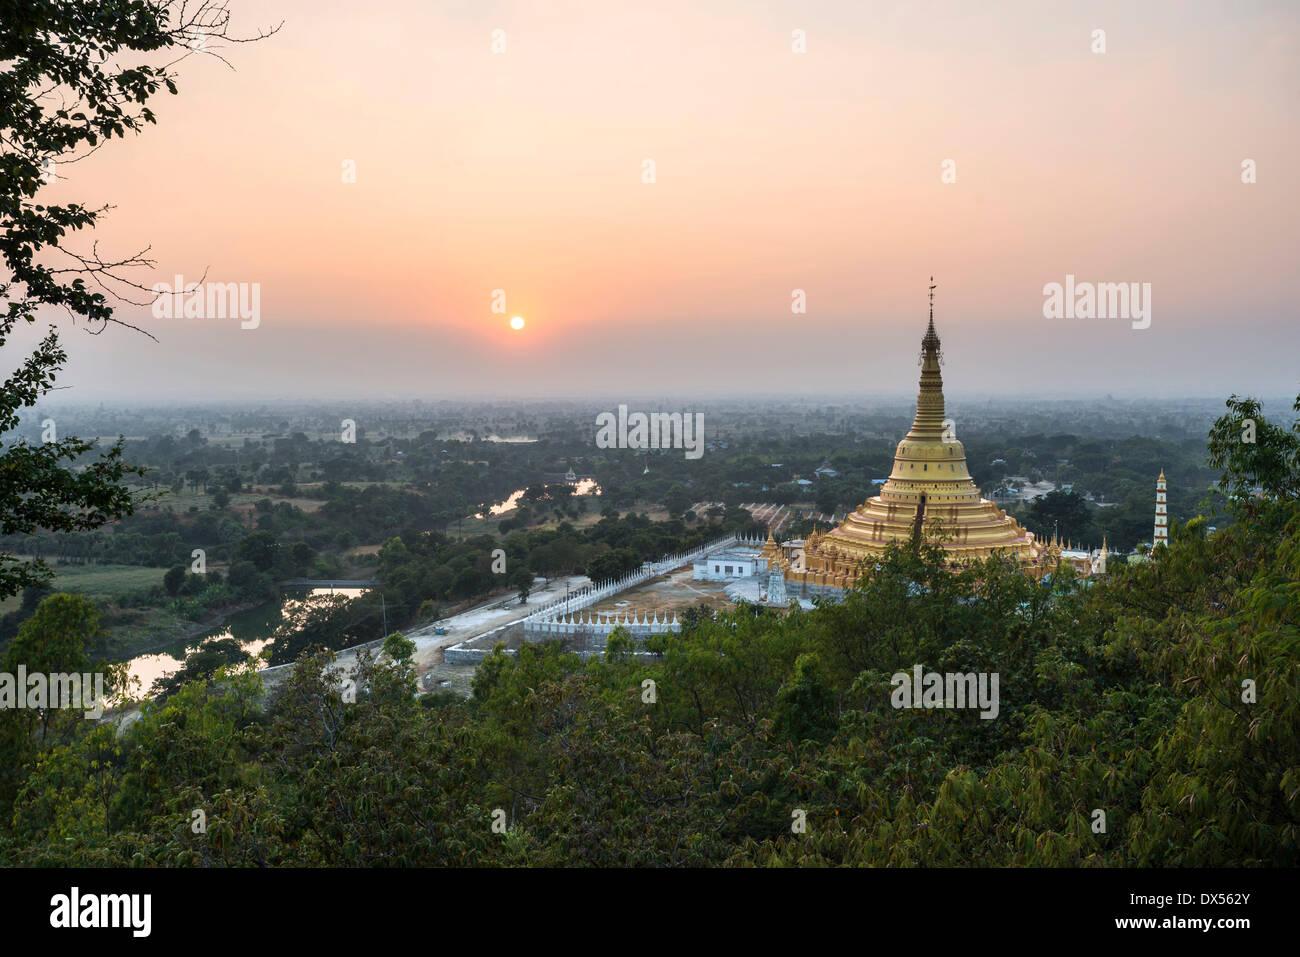 Aung Sakkya Pagoda, Maha Bodhi Ta Htaung, Monywa, Sagaing Region, Myanmar Stock Photo